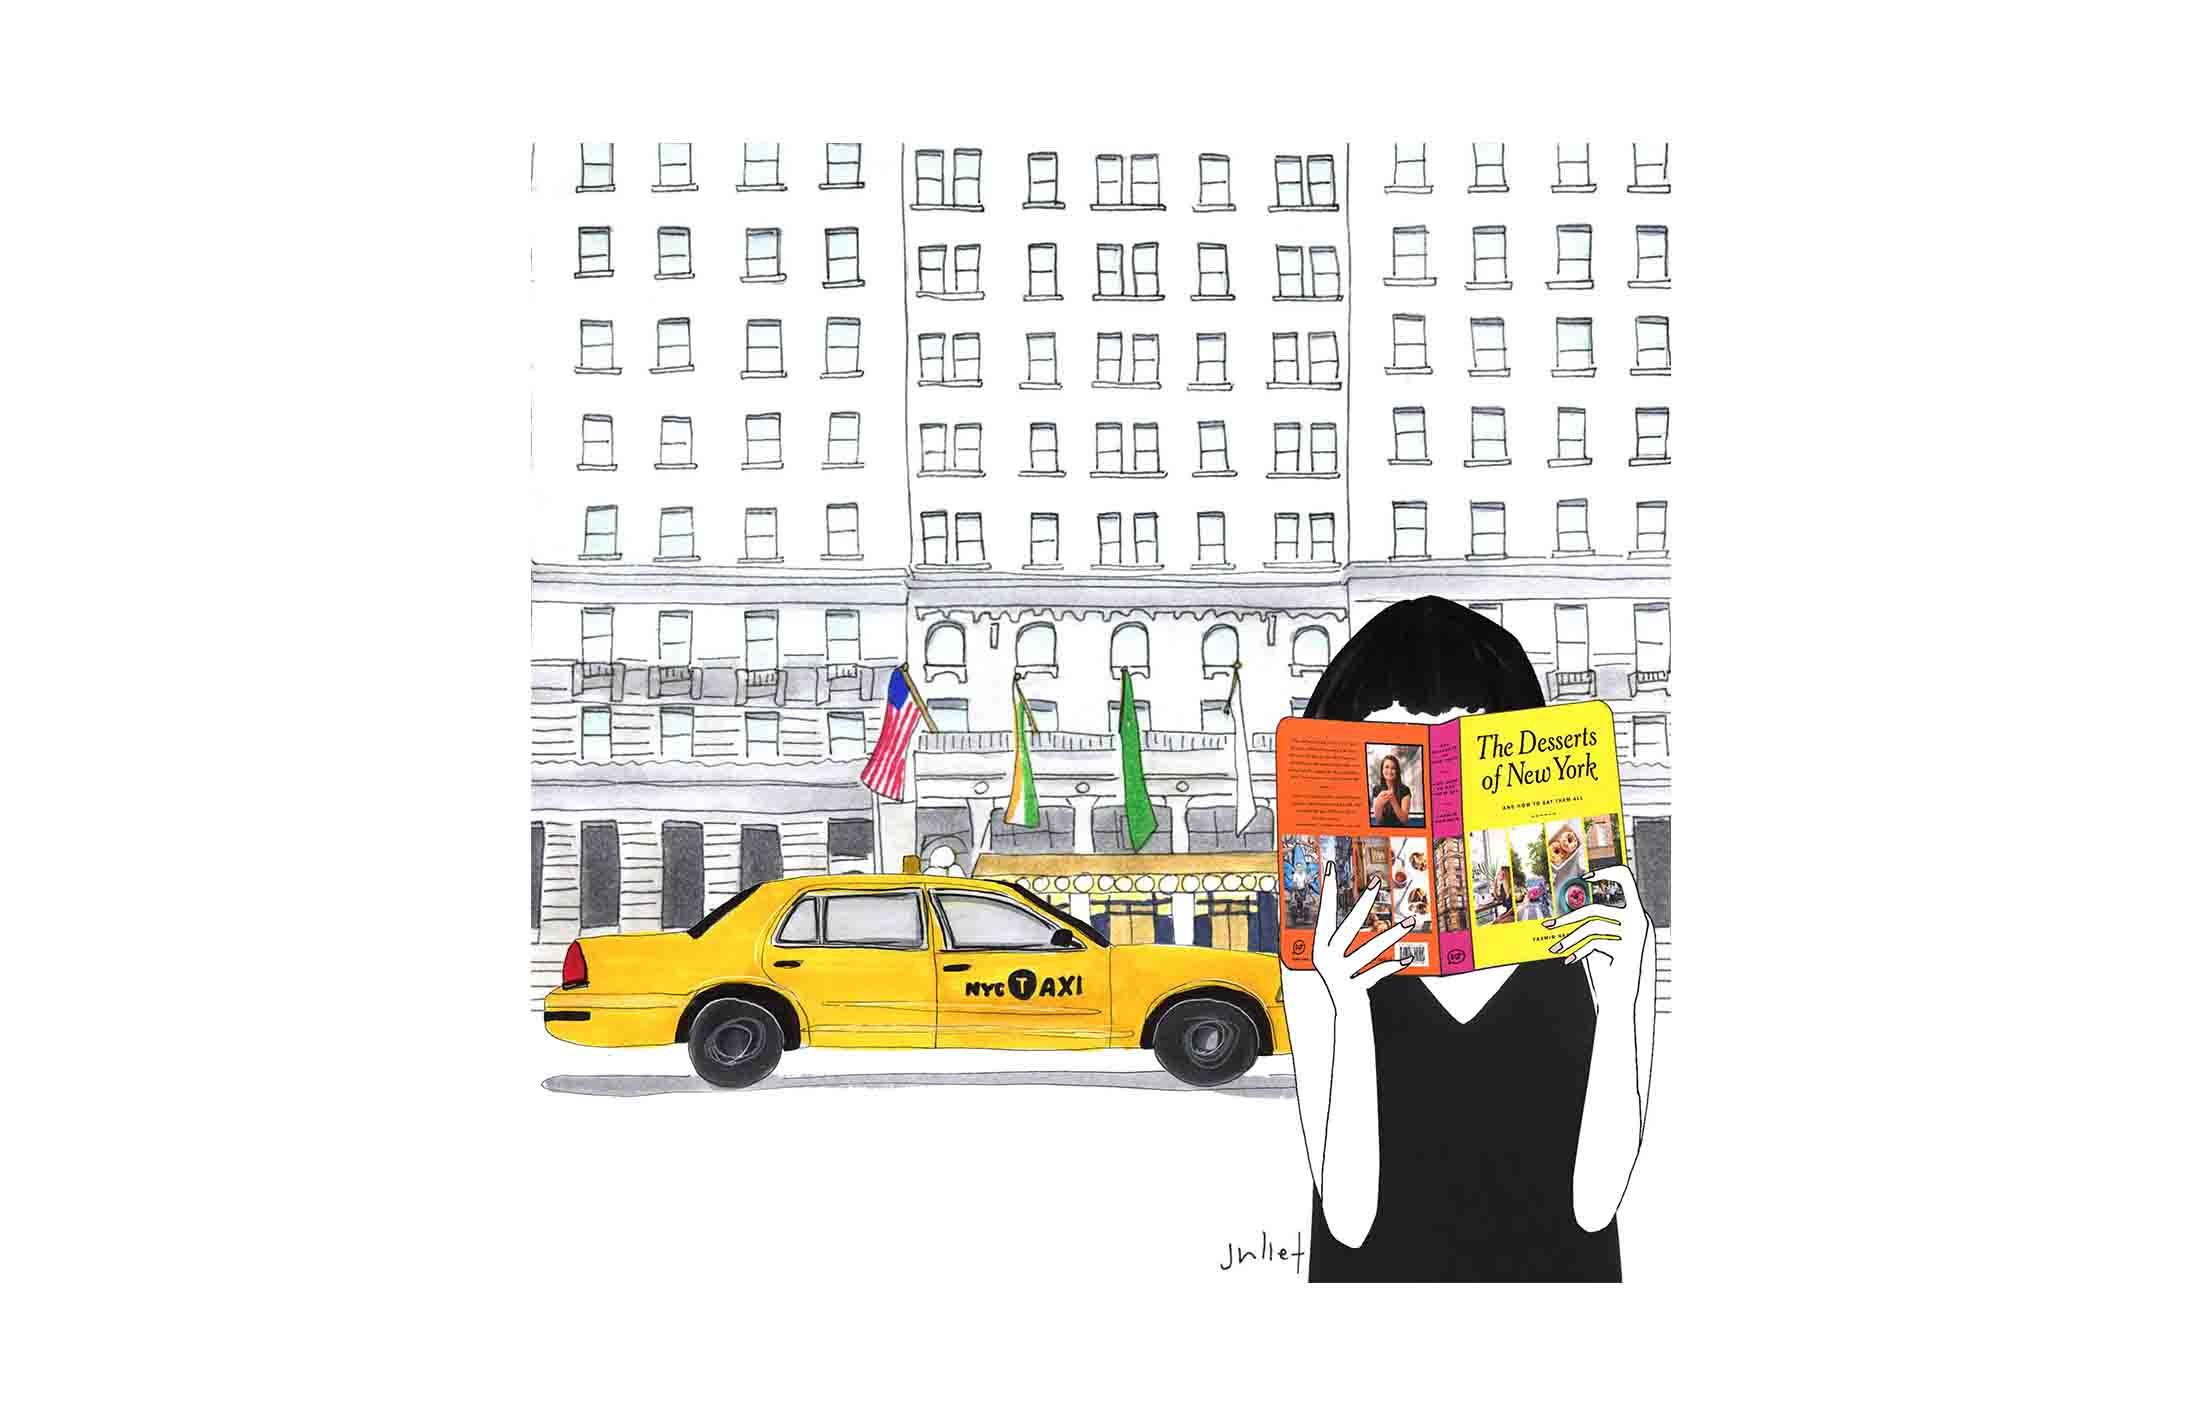 yasmin newman_the desserts of new york_the juliet report